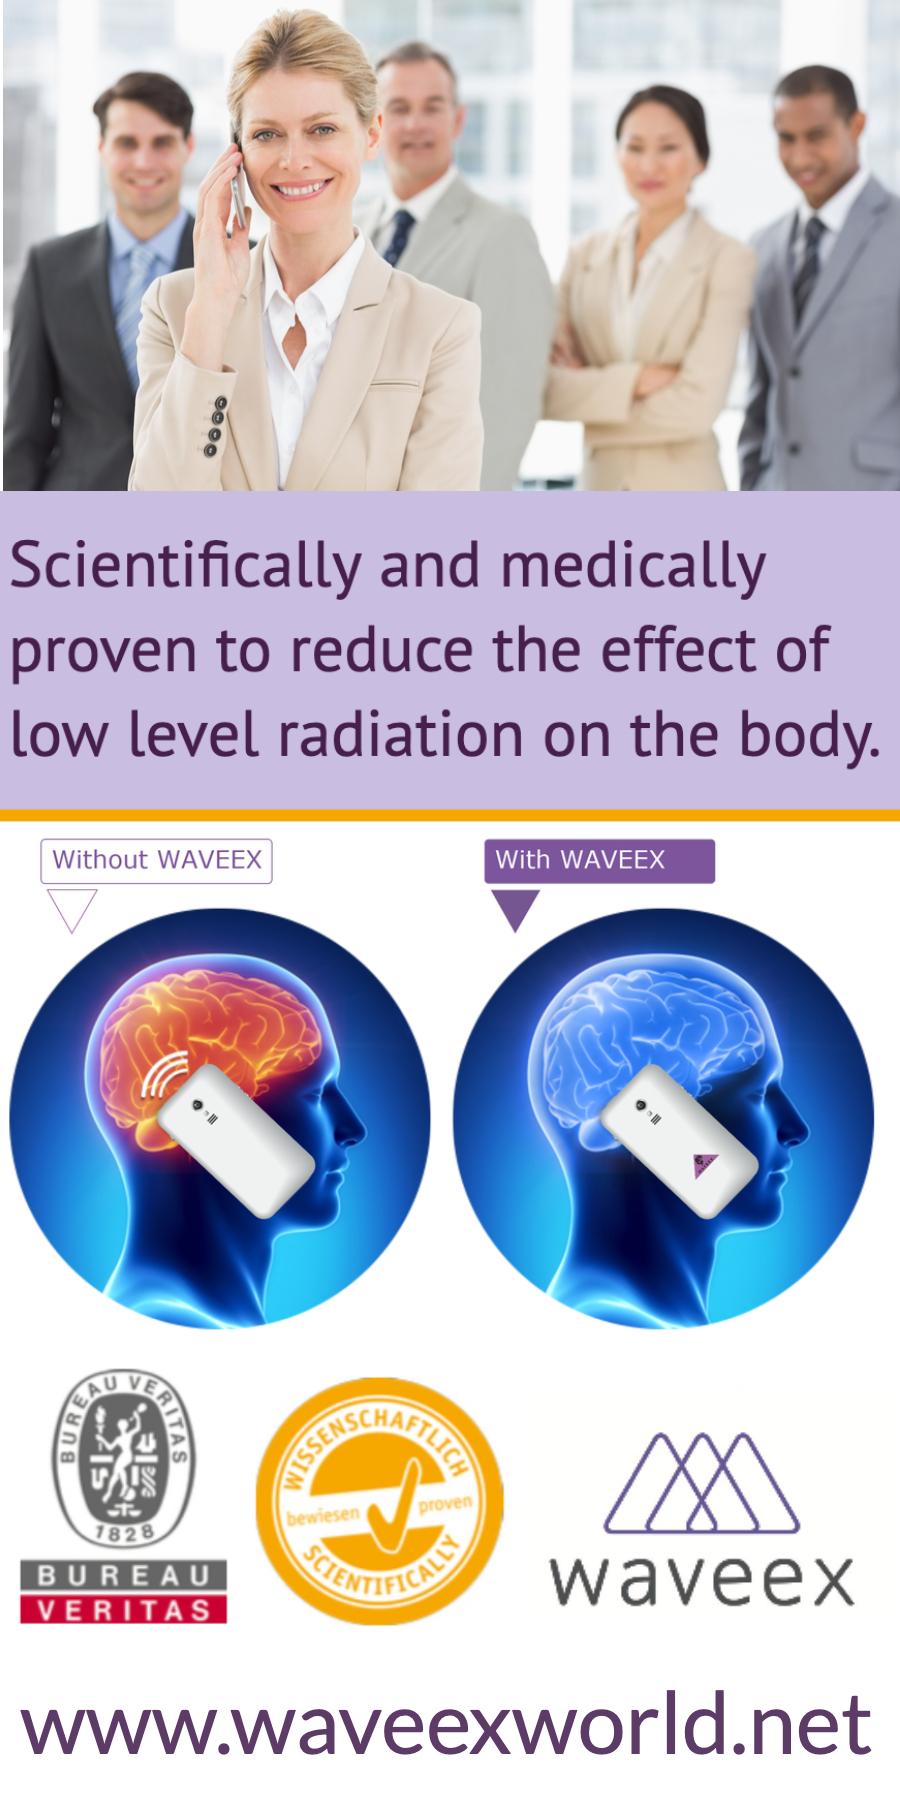 waveex radiation cell phones